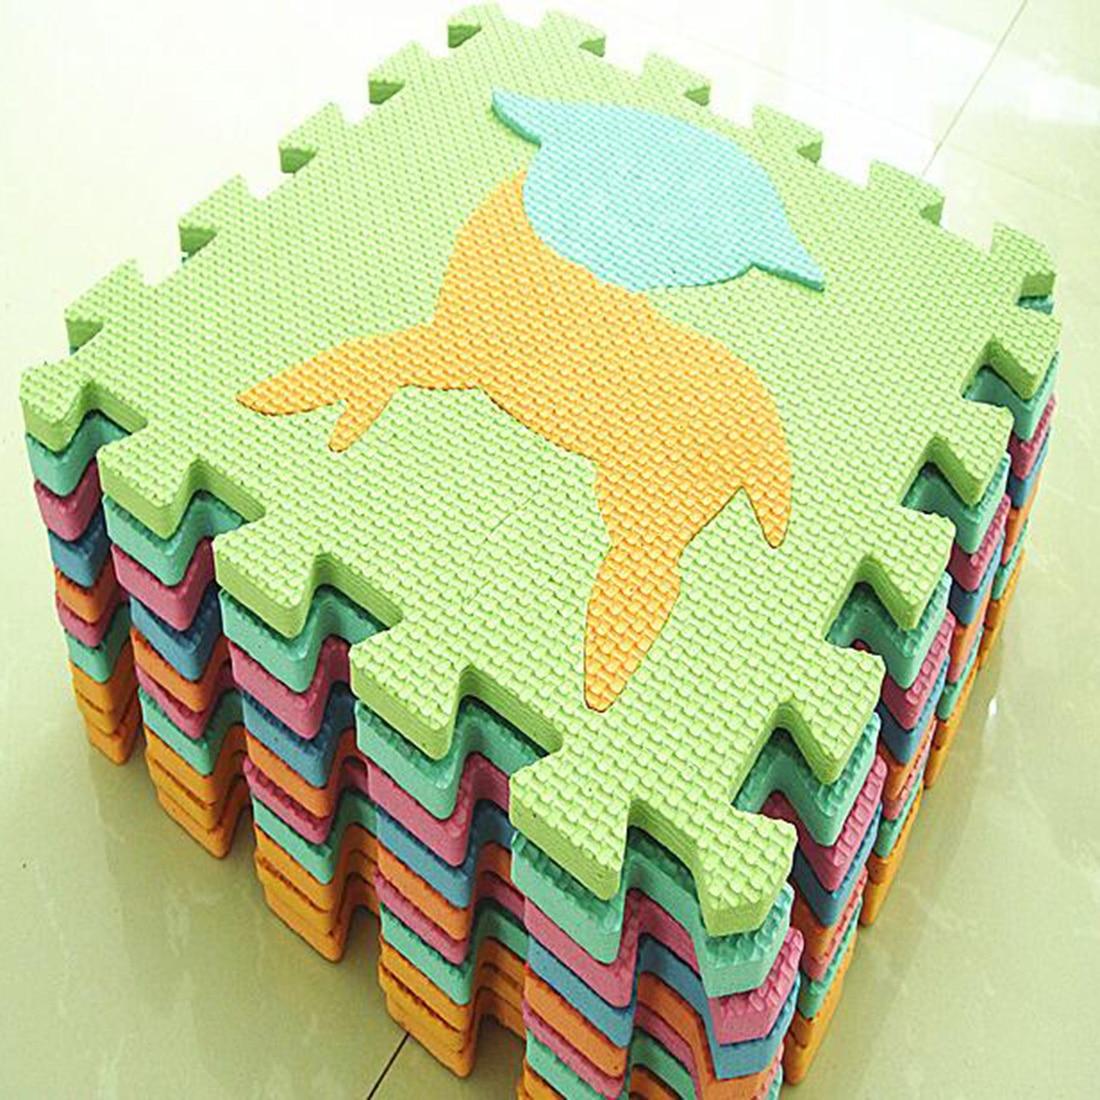 10pcs Set 30 30cm Eva Mat Puzzle Carpet Baby Play Mat